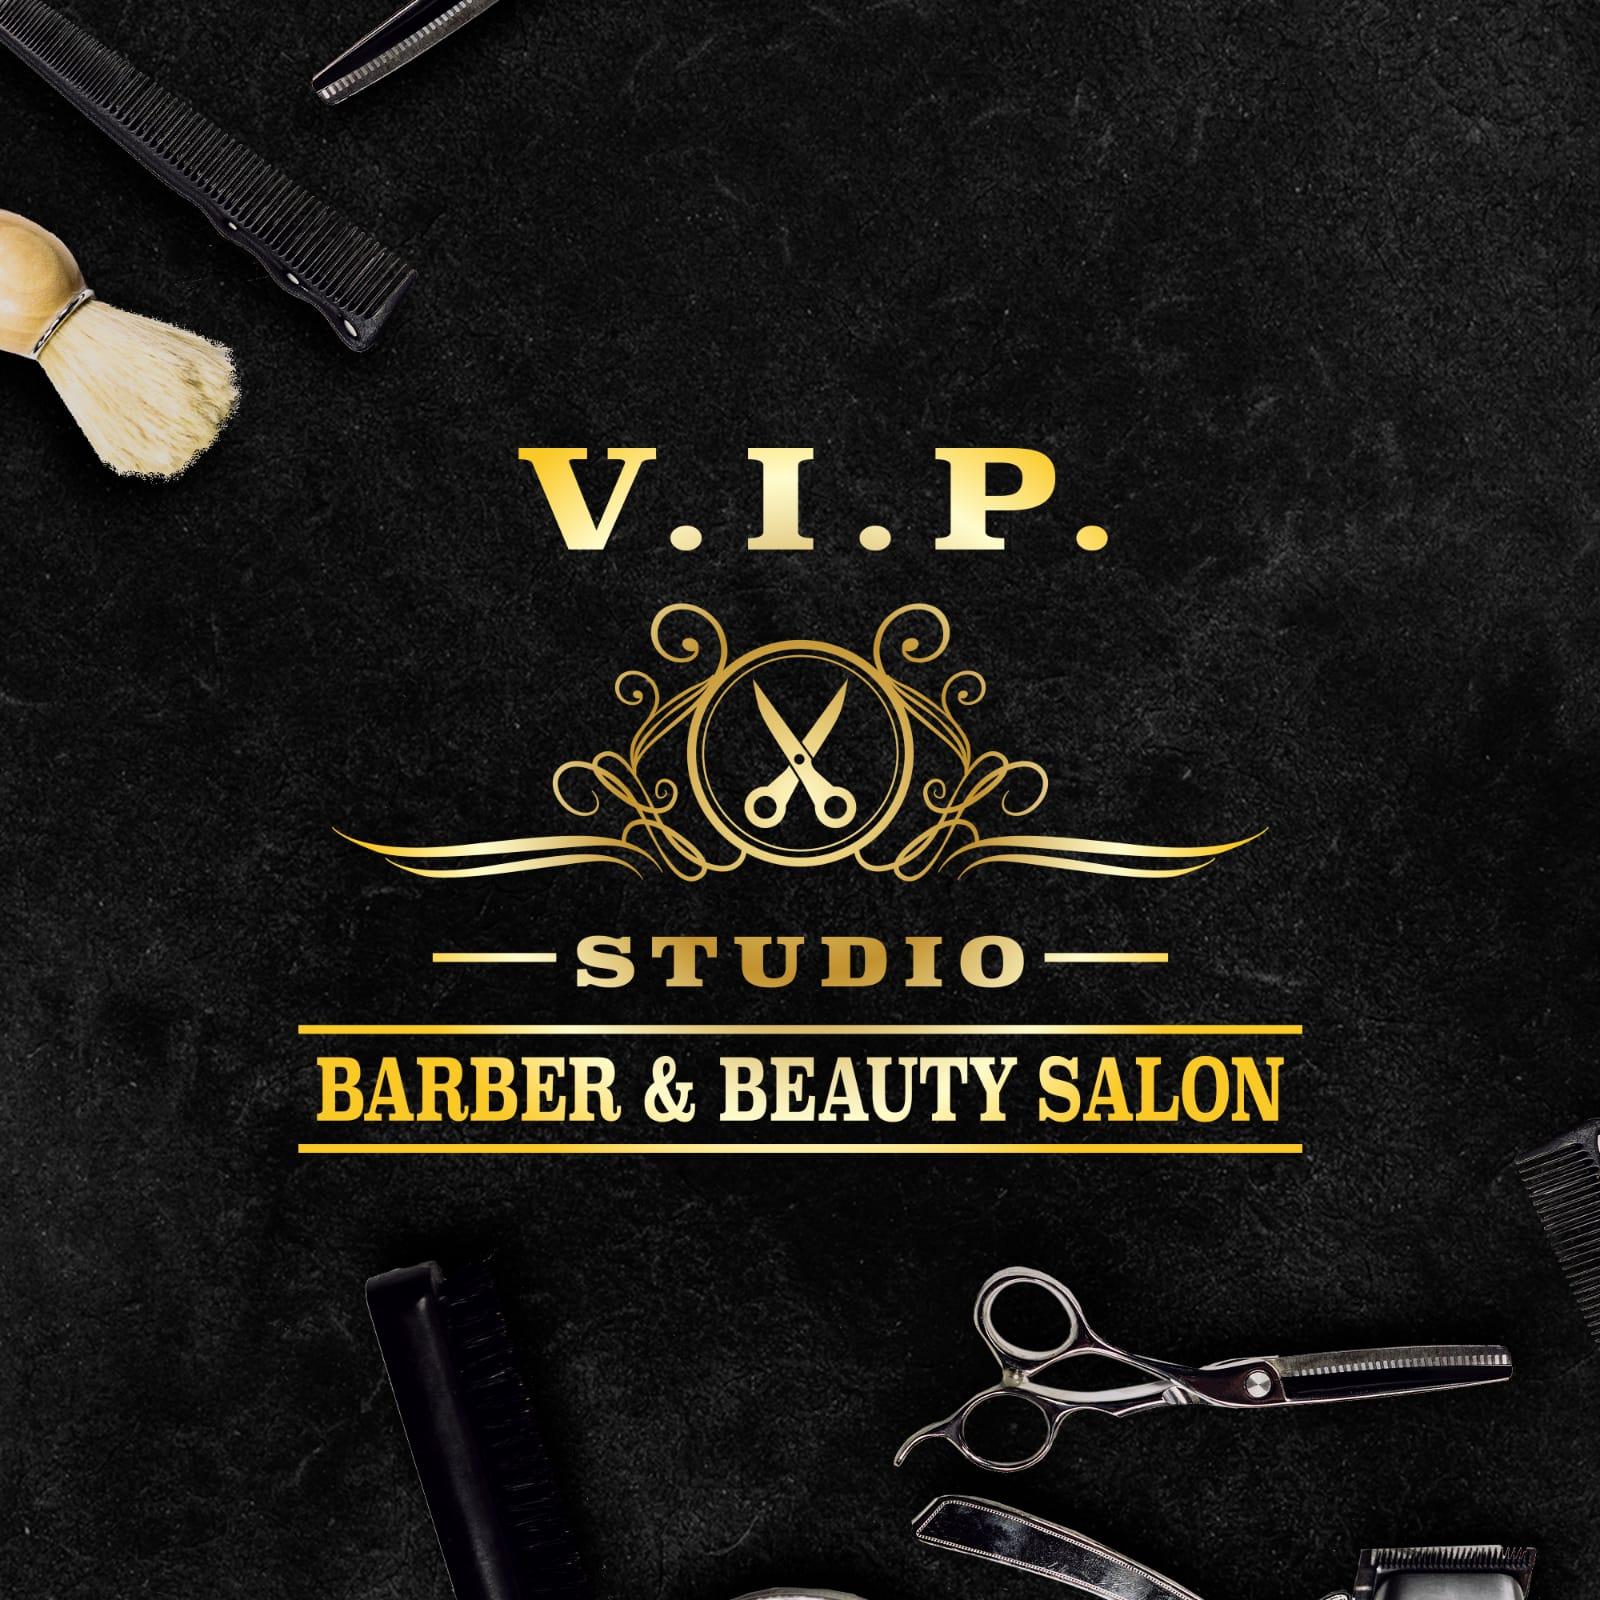 Vip Studio Barber & Beauty Salon